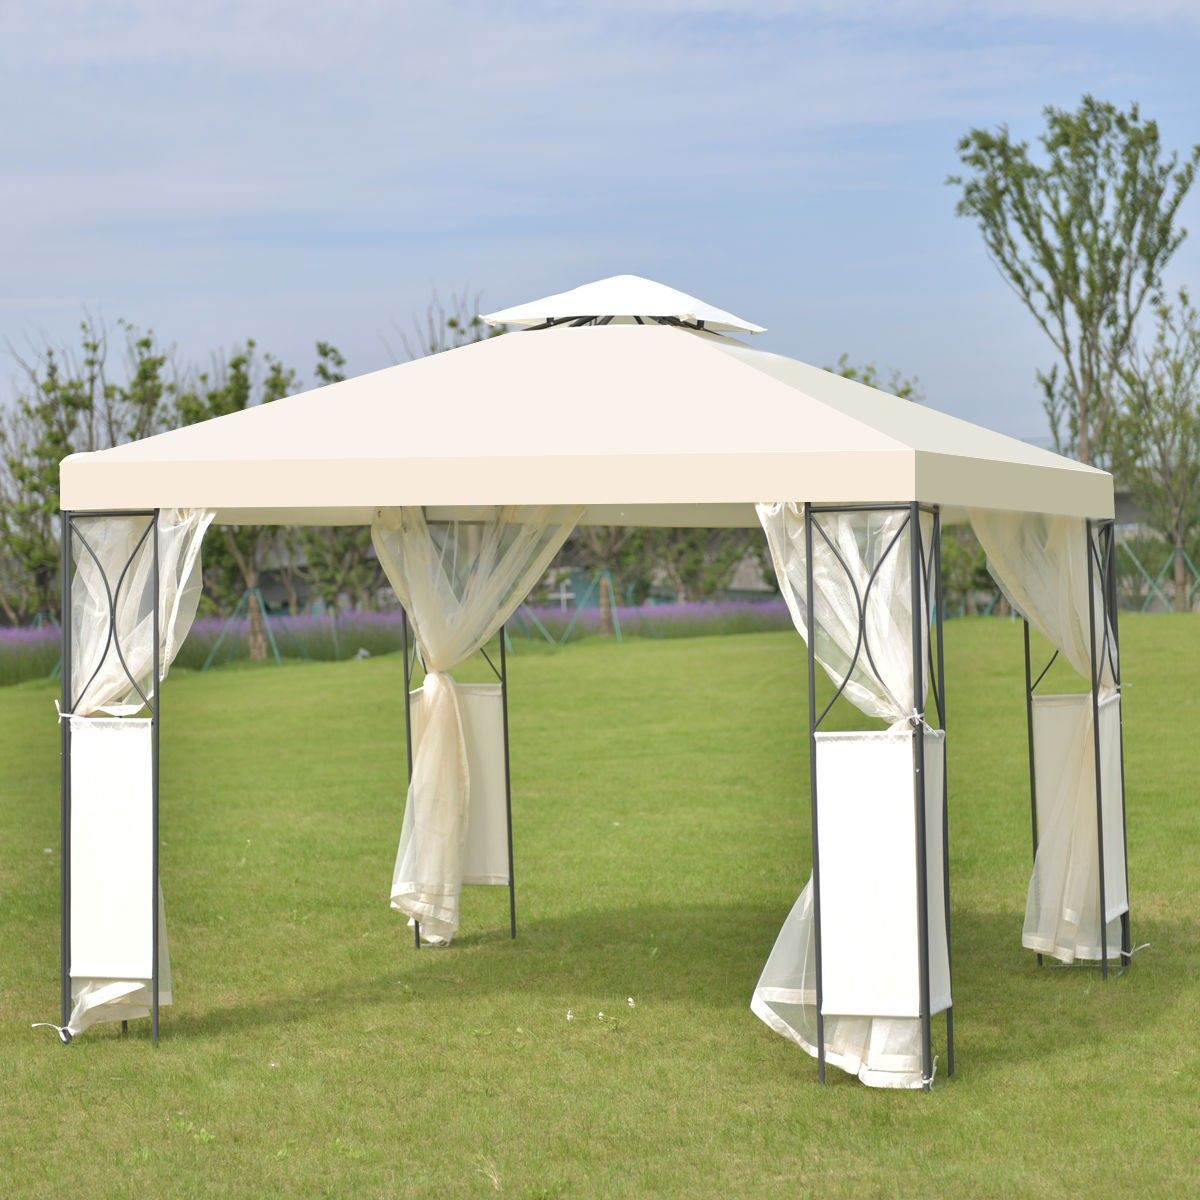 2 Tier 10 X 10 Patio Steel Gazebo Canopy Shelter Canopy Tent